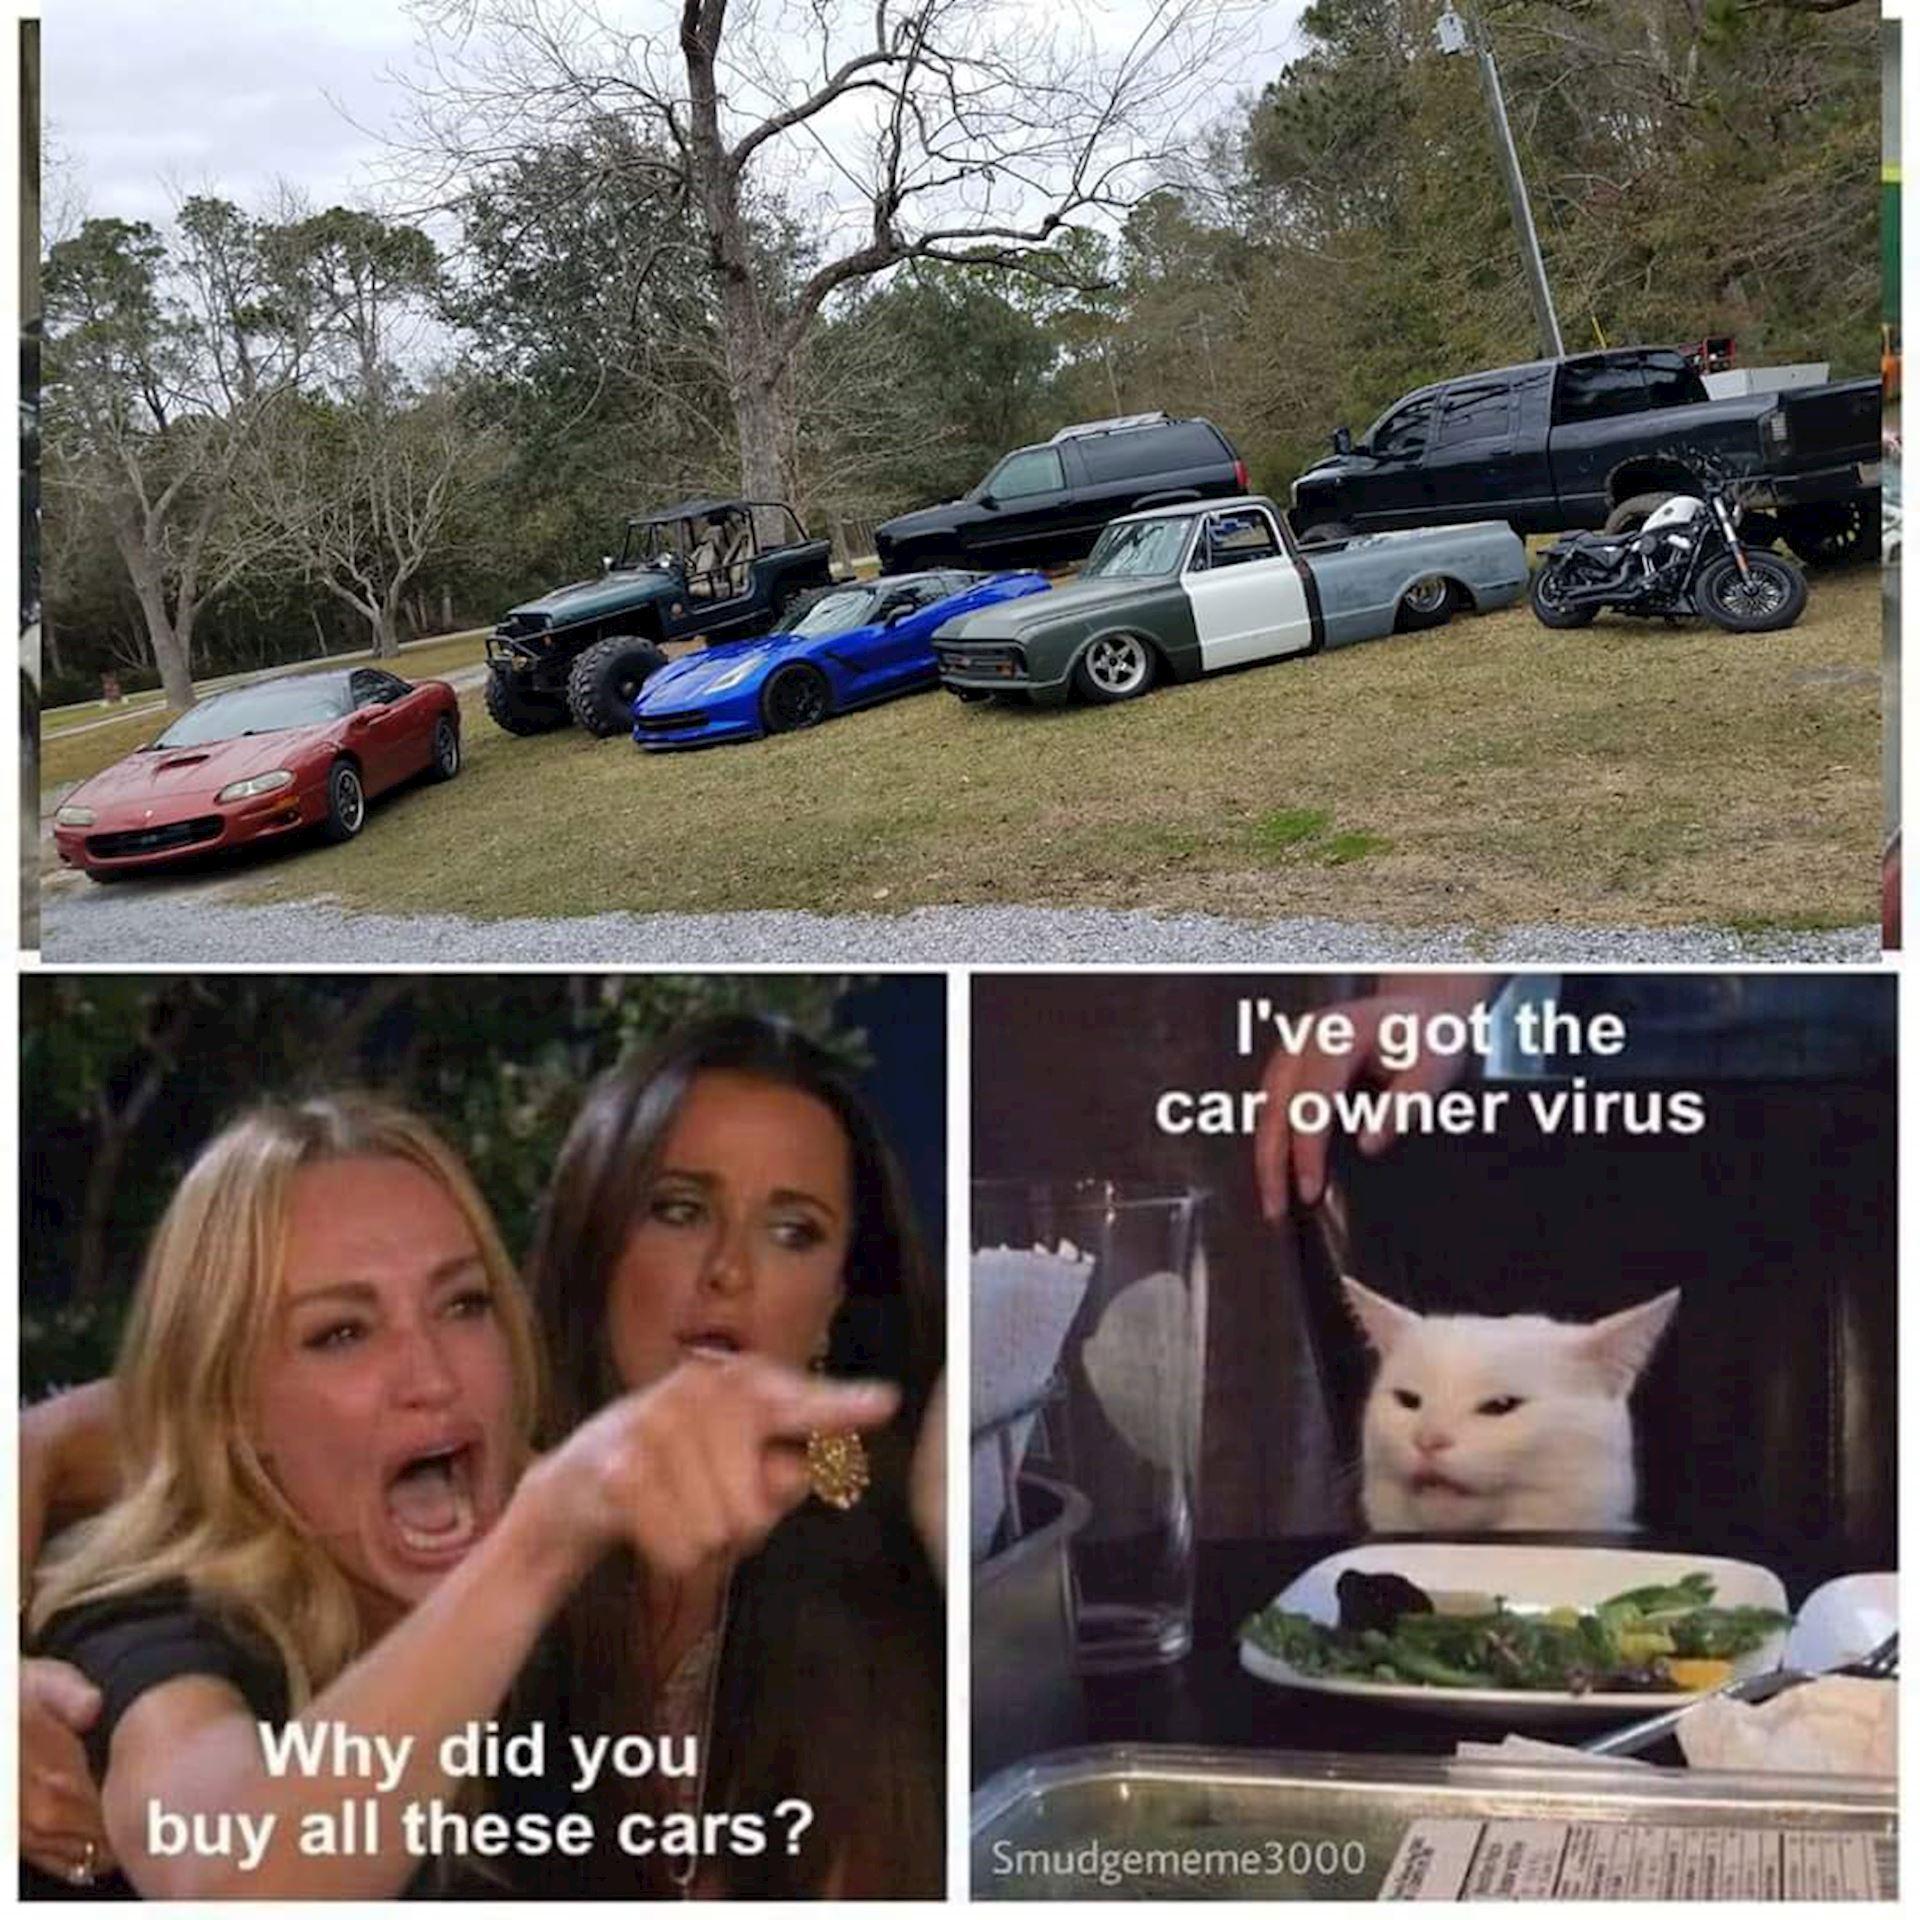 Get the Car owner virus!